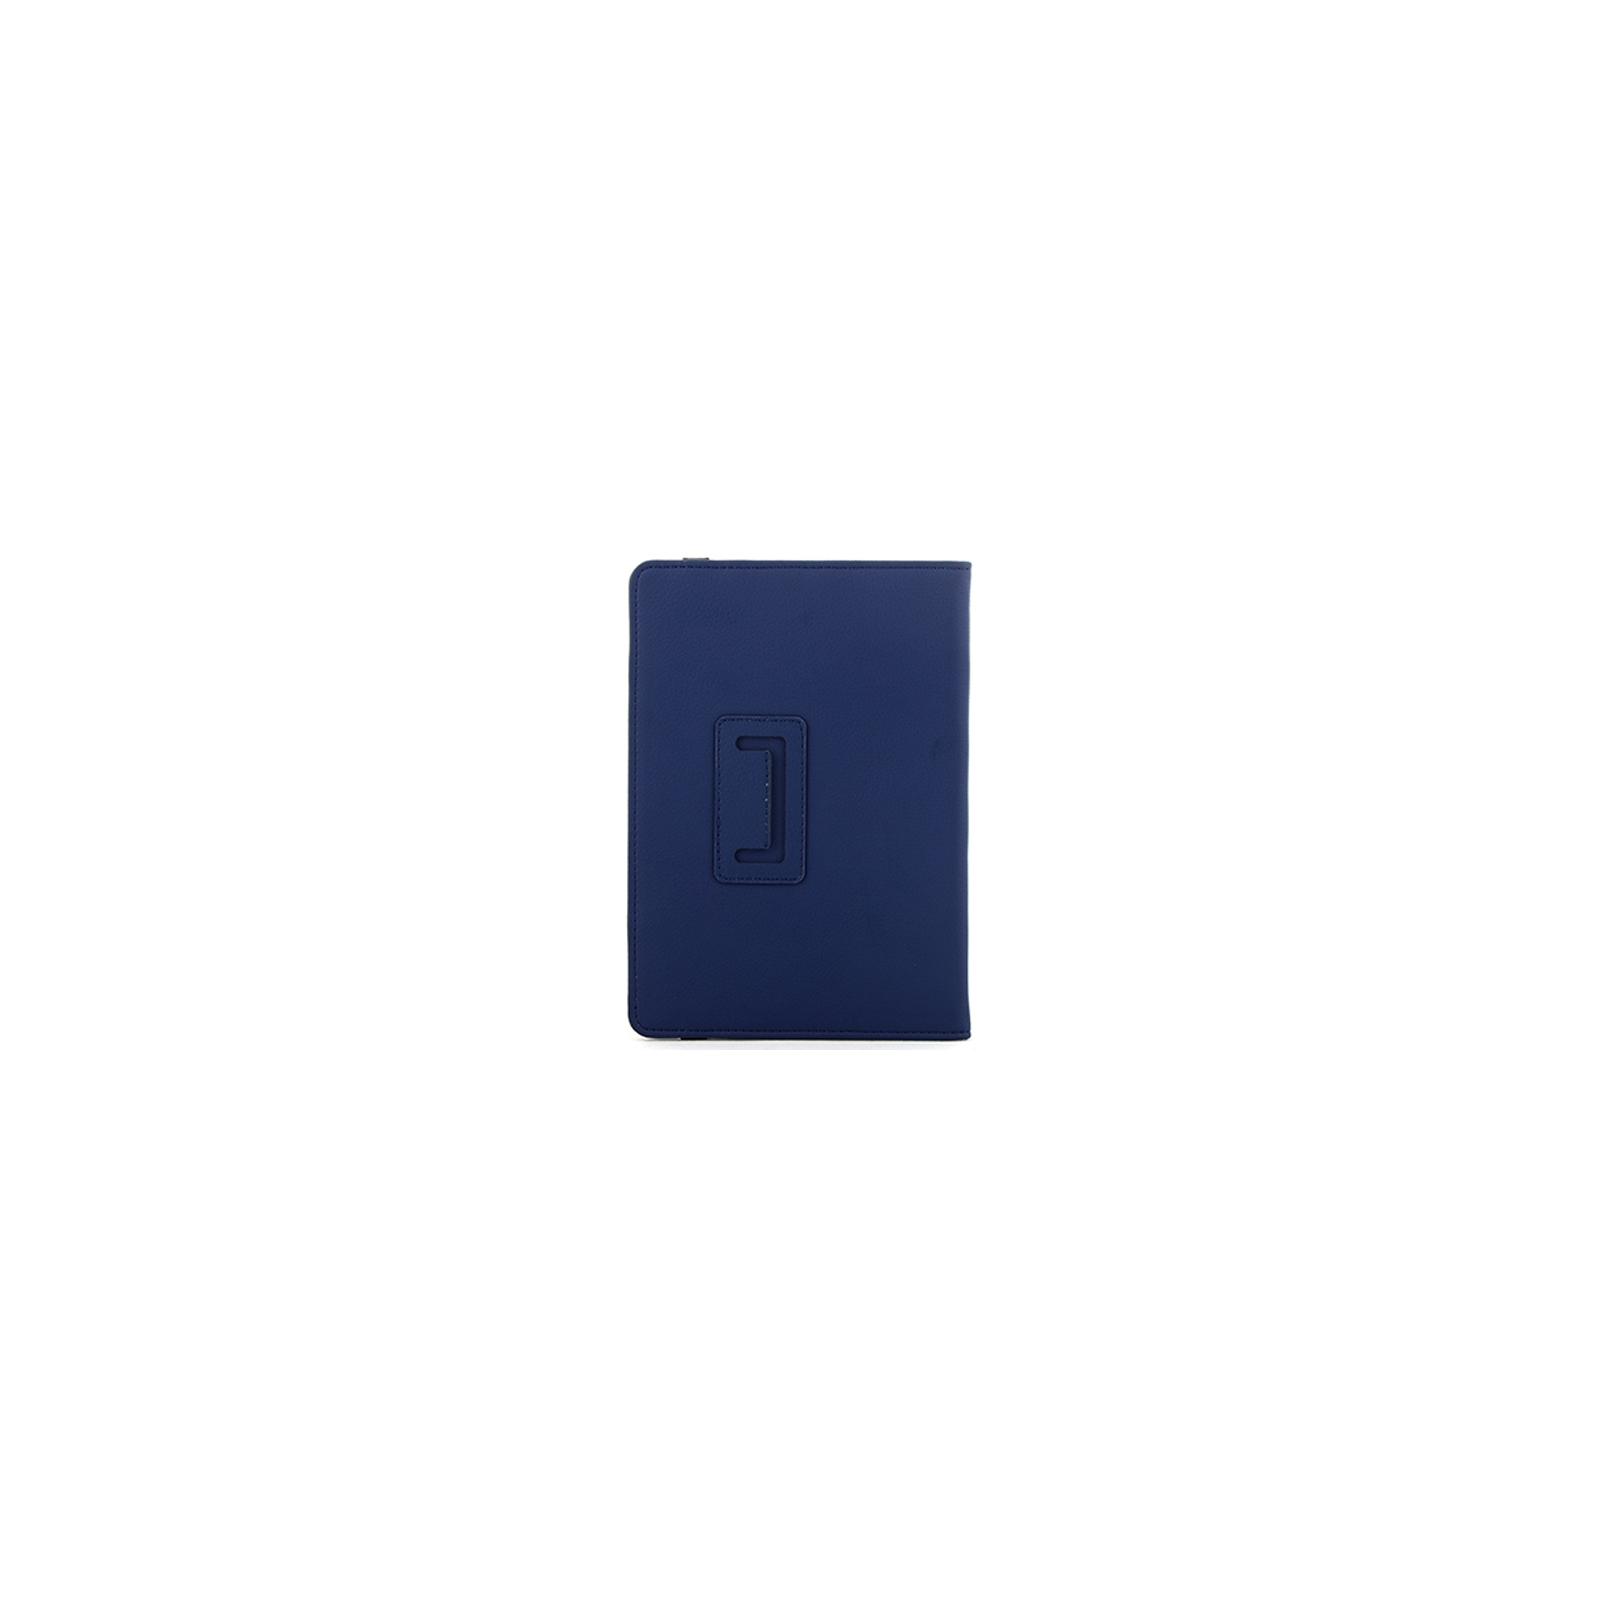 "Чехол для планшета 7"" Cover Stand Blue Drobak (216894) изображение 2"